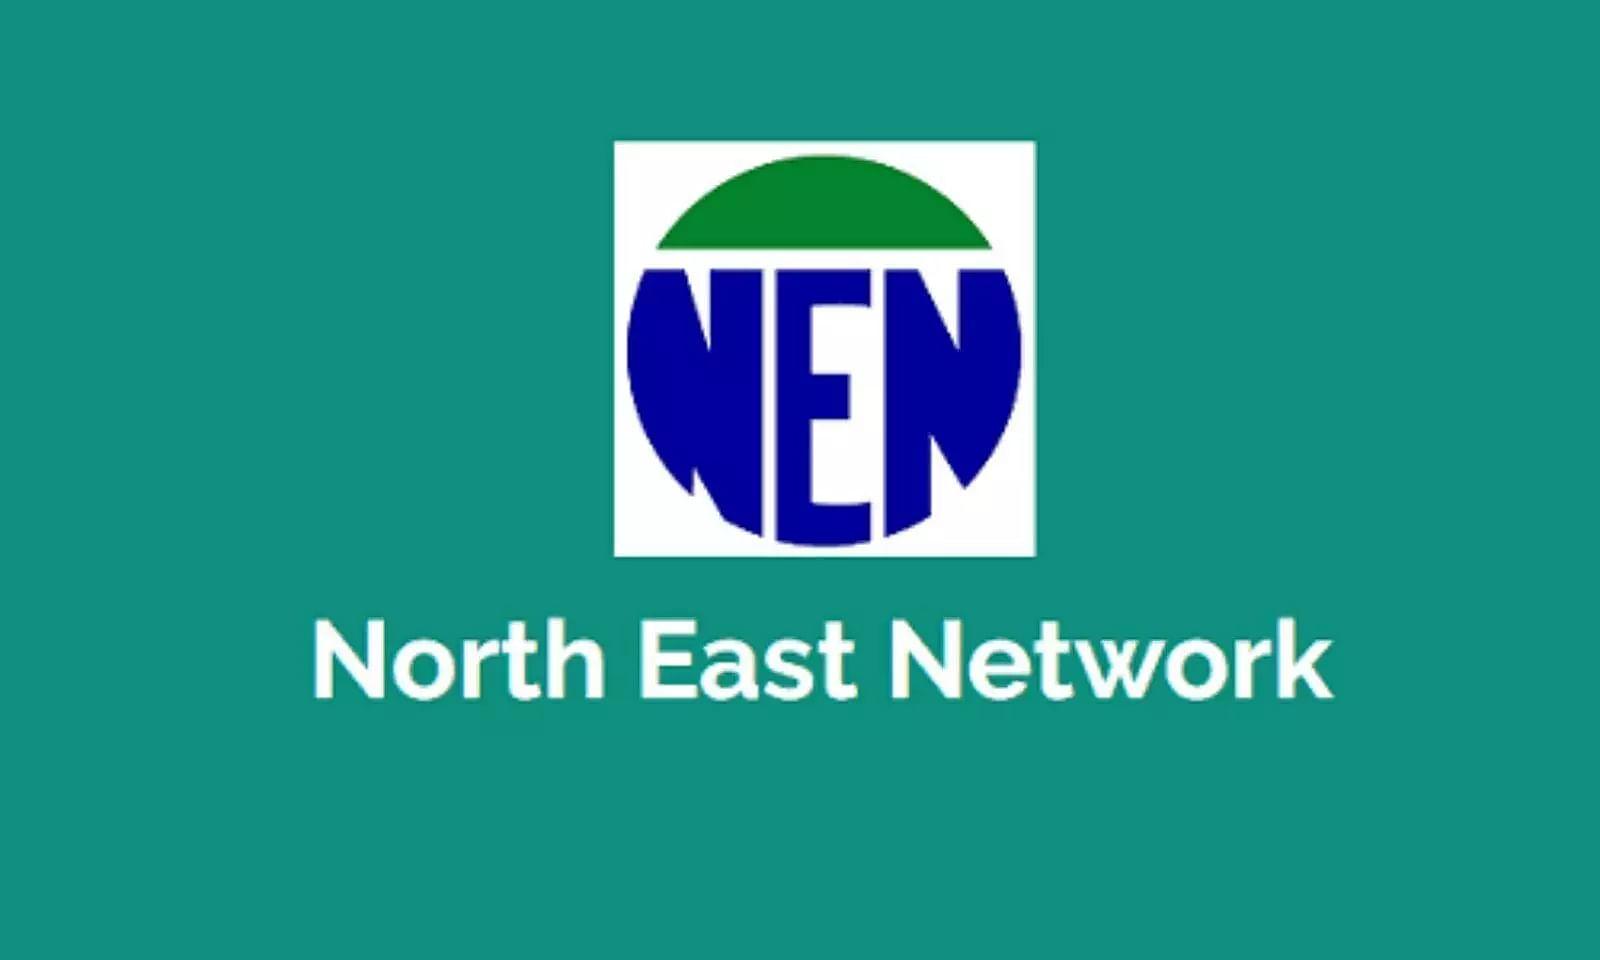 North East Network Guwahati Recruitment 2021: Accountant Vacancy, Job Openings